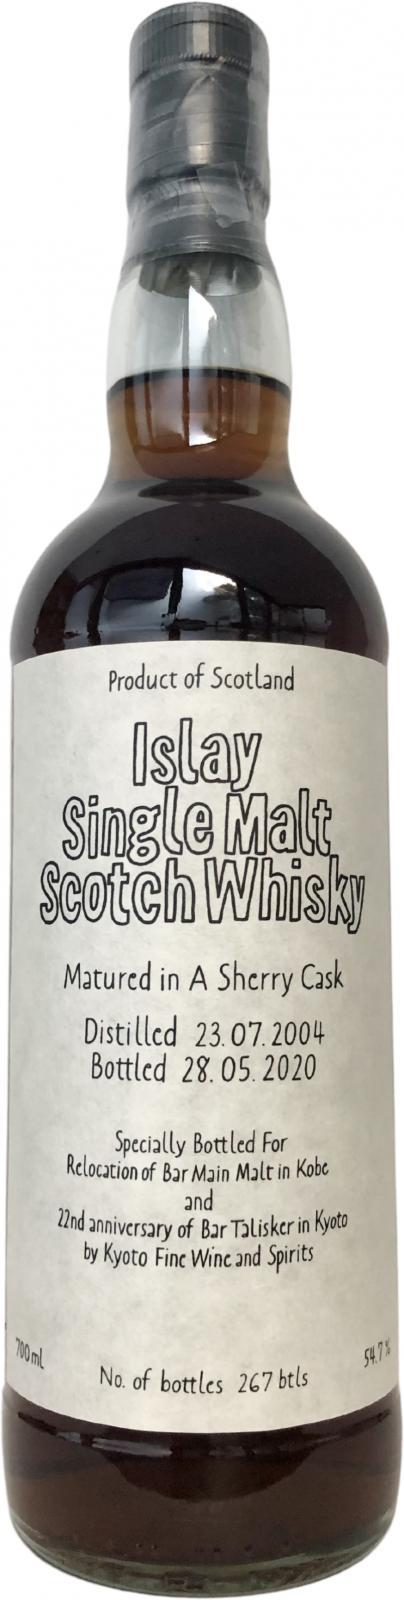 Islay Single Malt Scotch Whisky 2004 UD